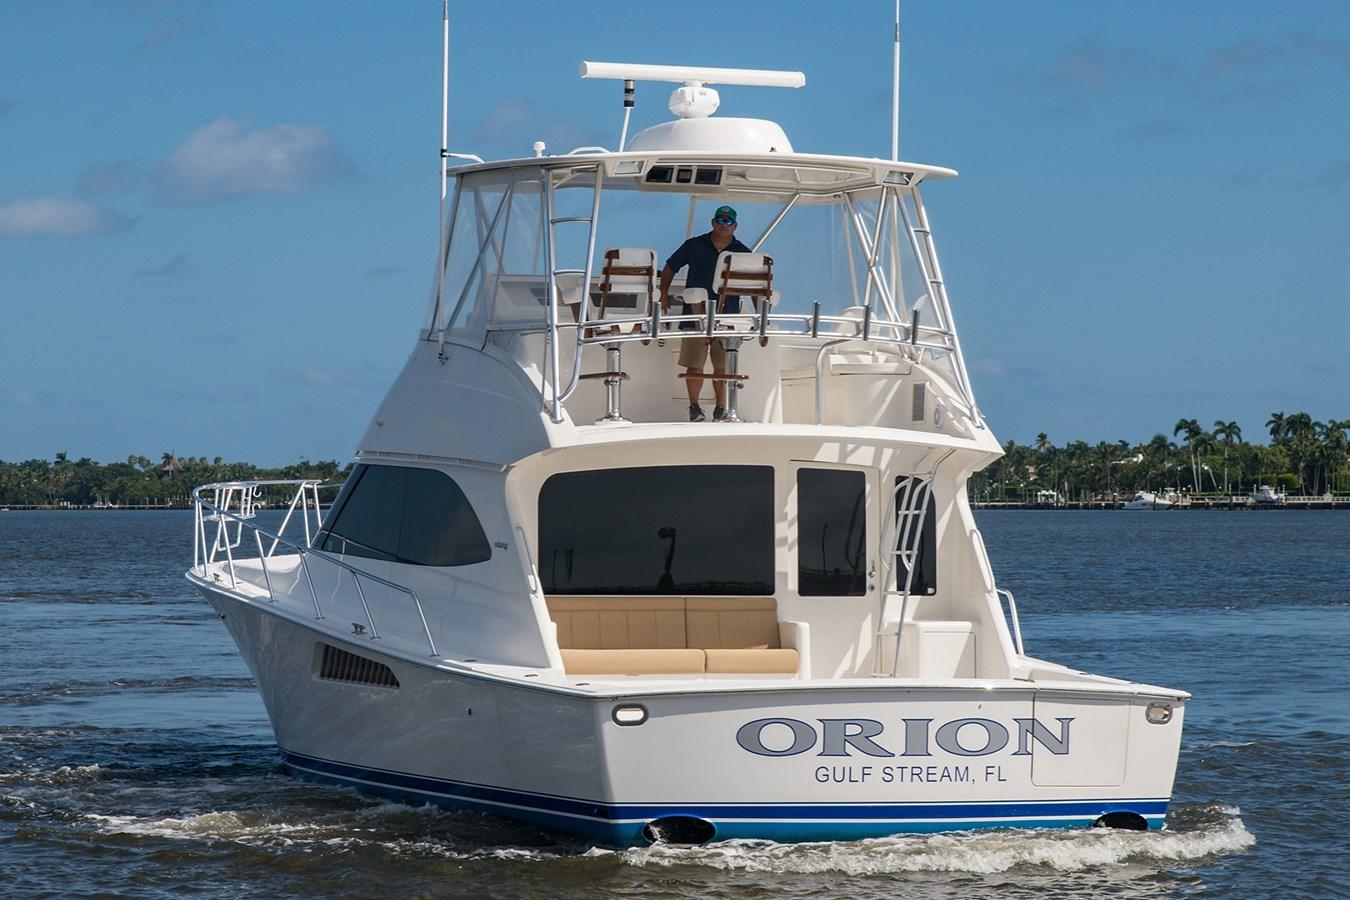 Orion_Stern Profile3 2009 VIKING 50 Convertible Sport Fisherman 2941838